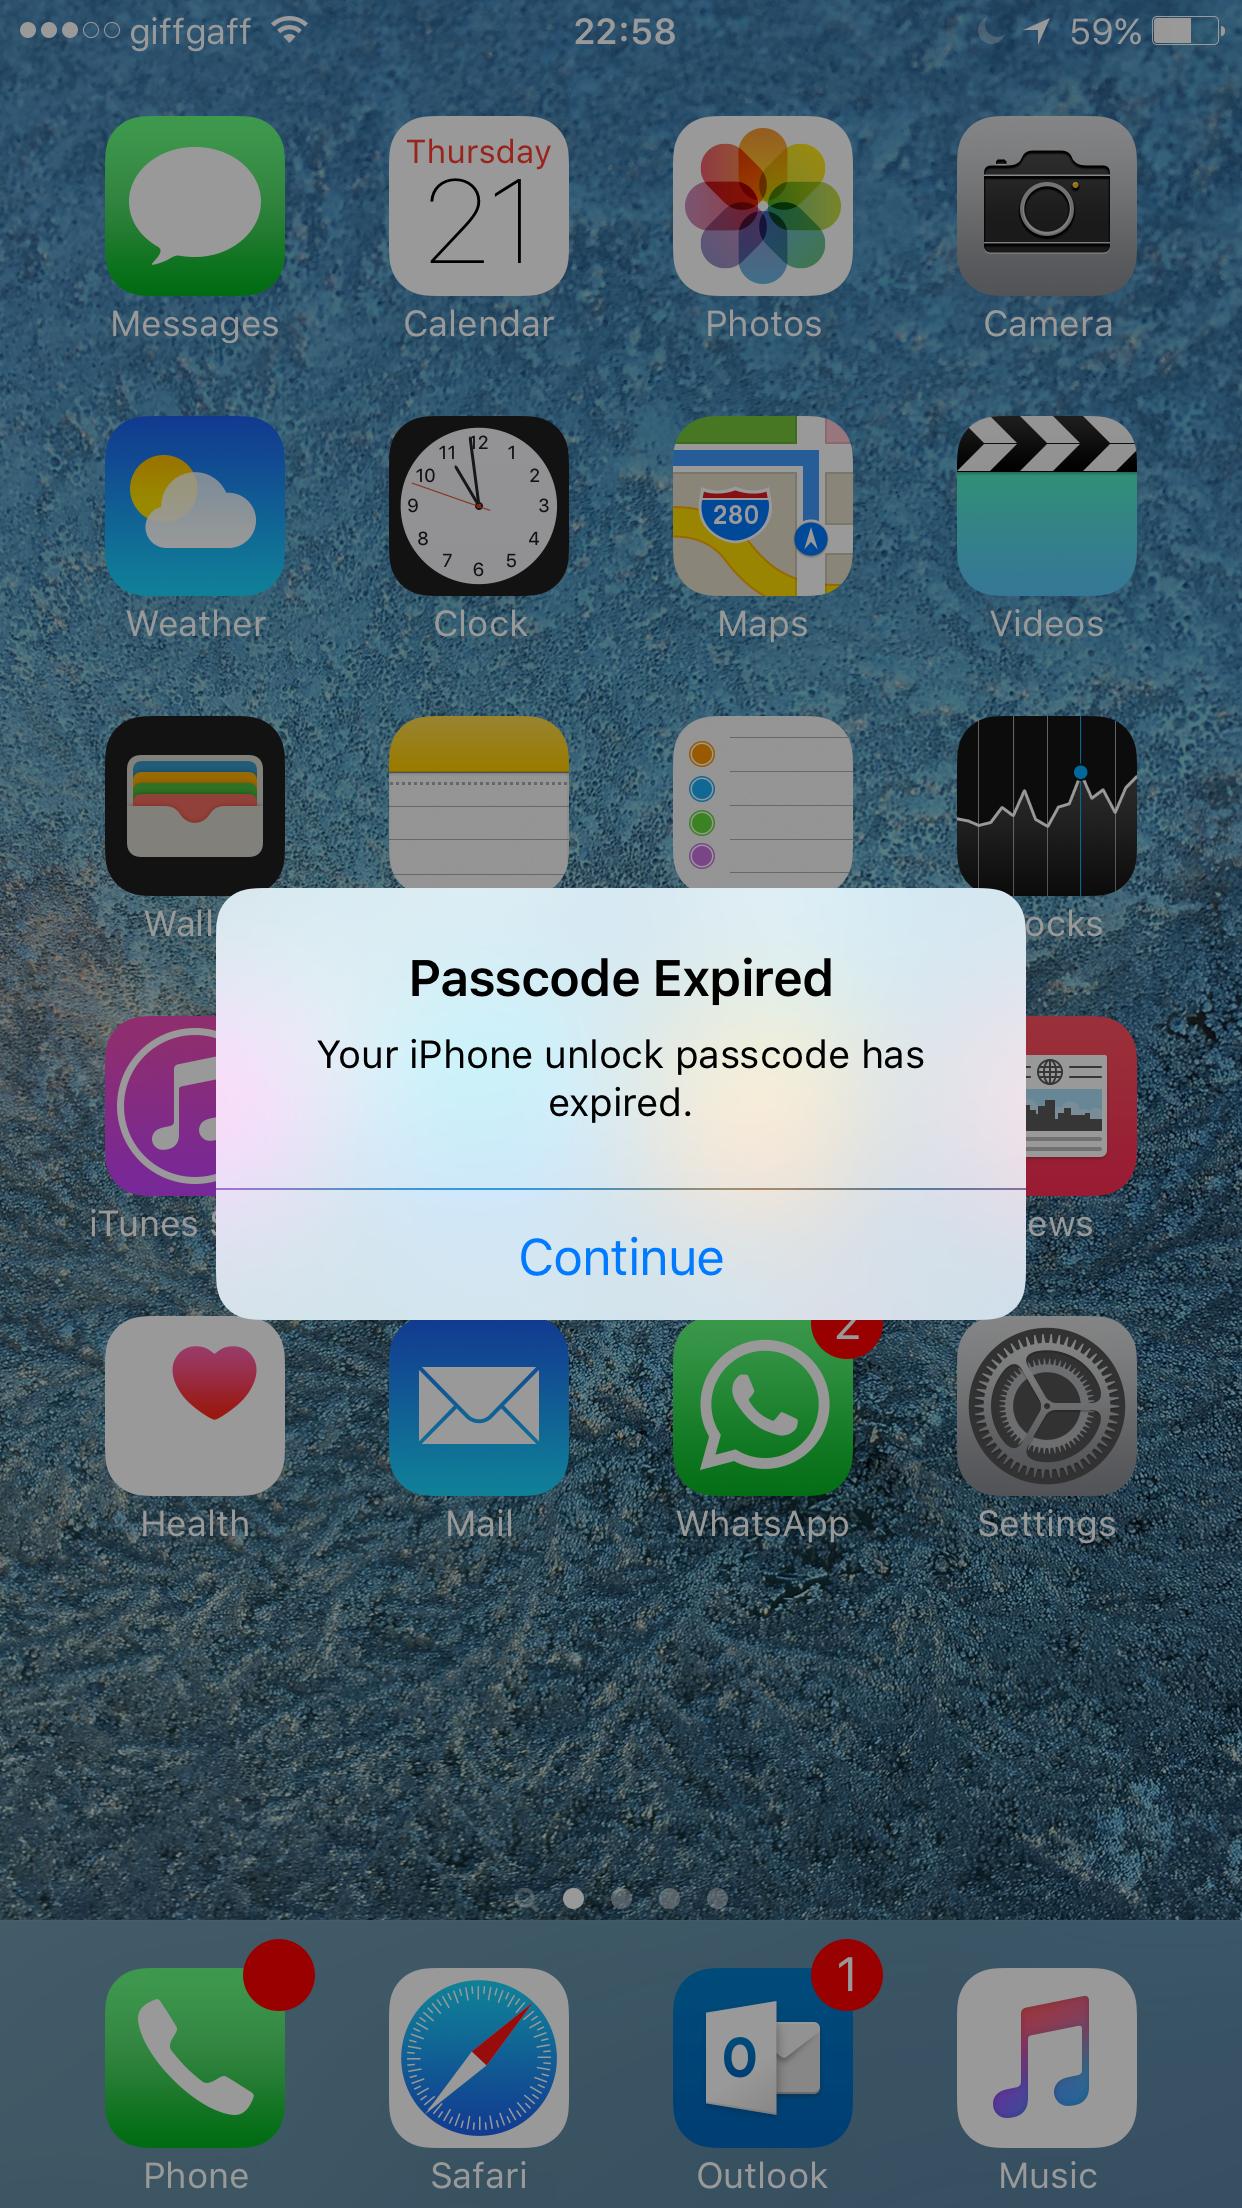 iPhone - Password expired?! | MacRumors Forums